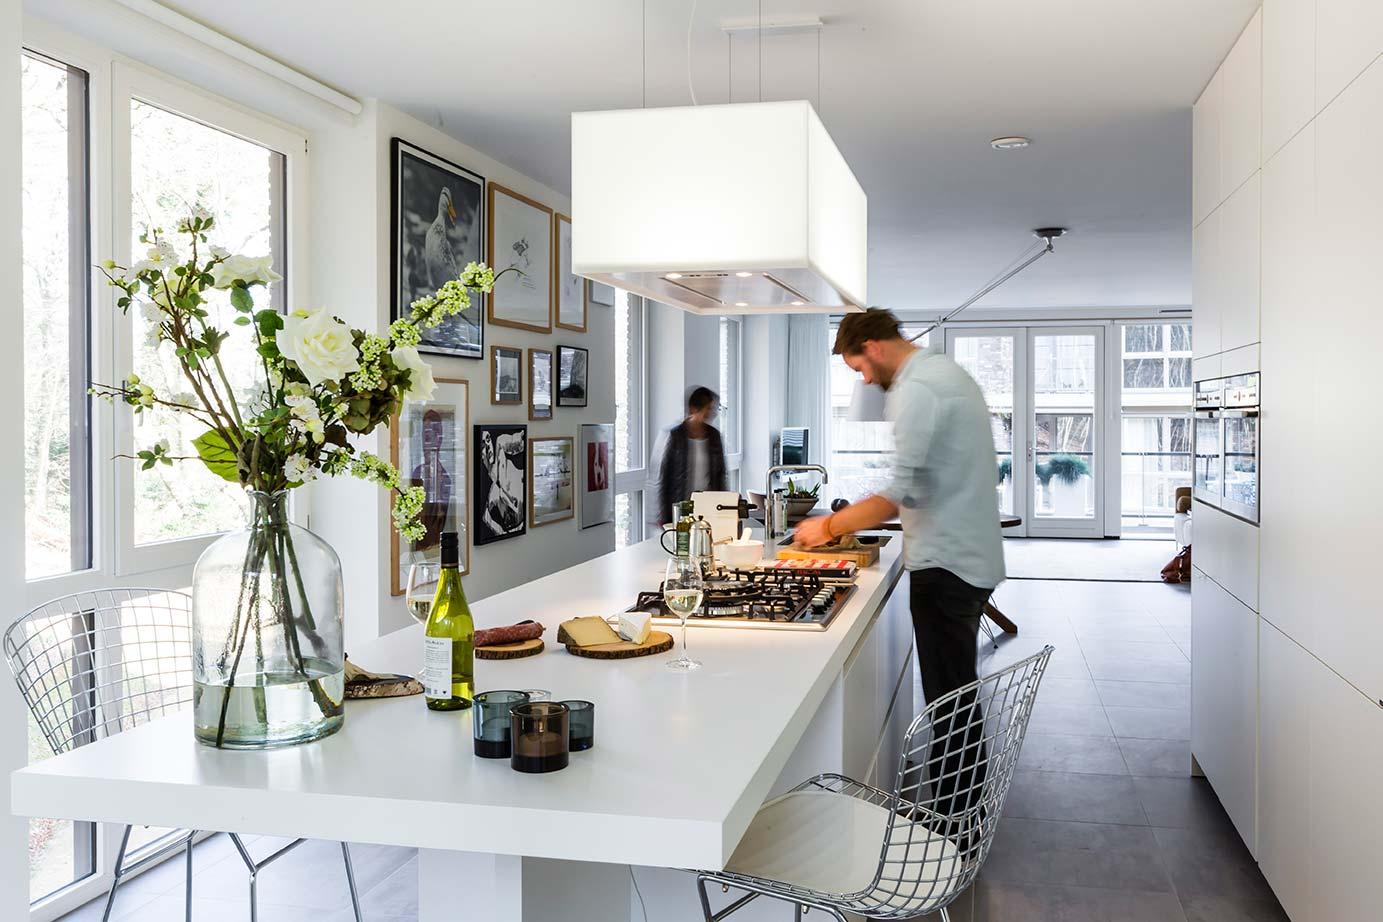 Siematic Keuken Ontwerpen : SieMatic keuken